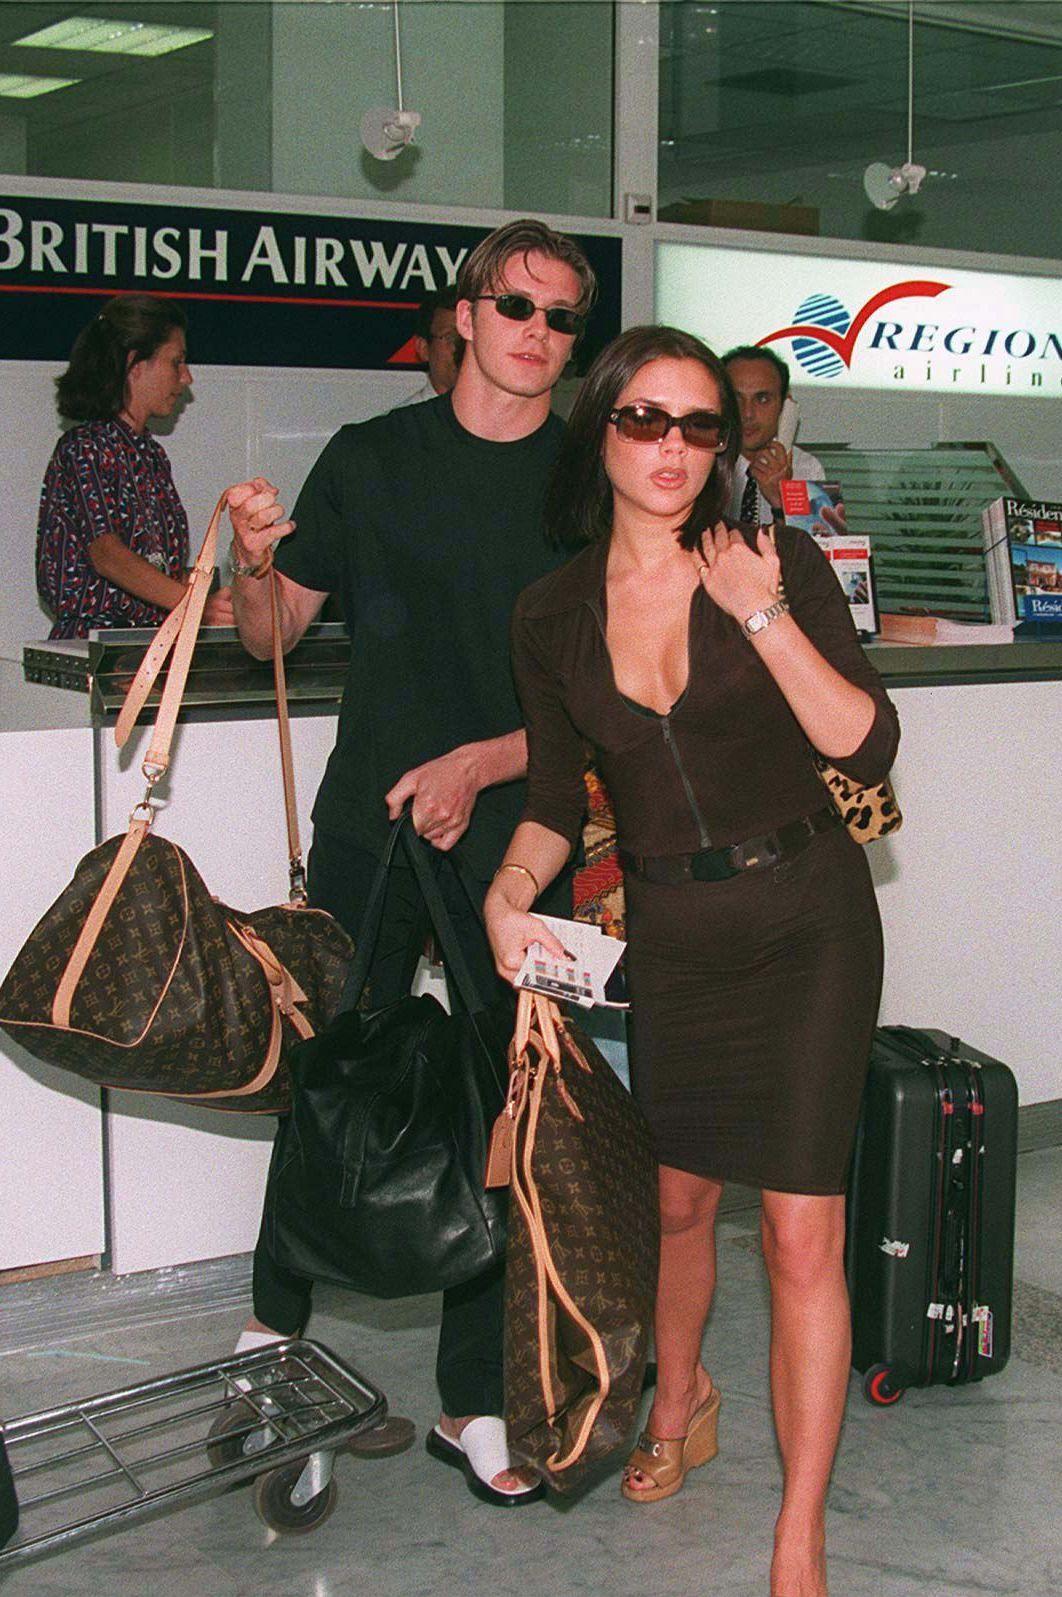 docu-serie su David e Victoria Beckham - Neomag.